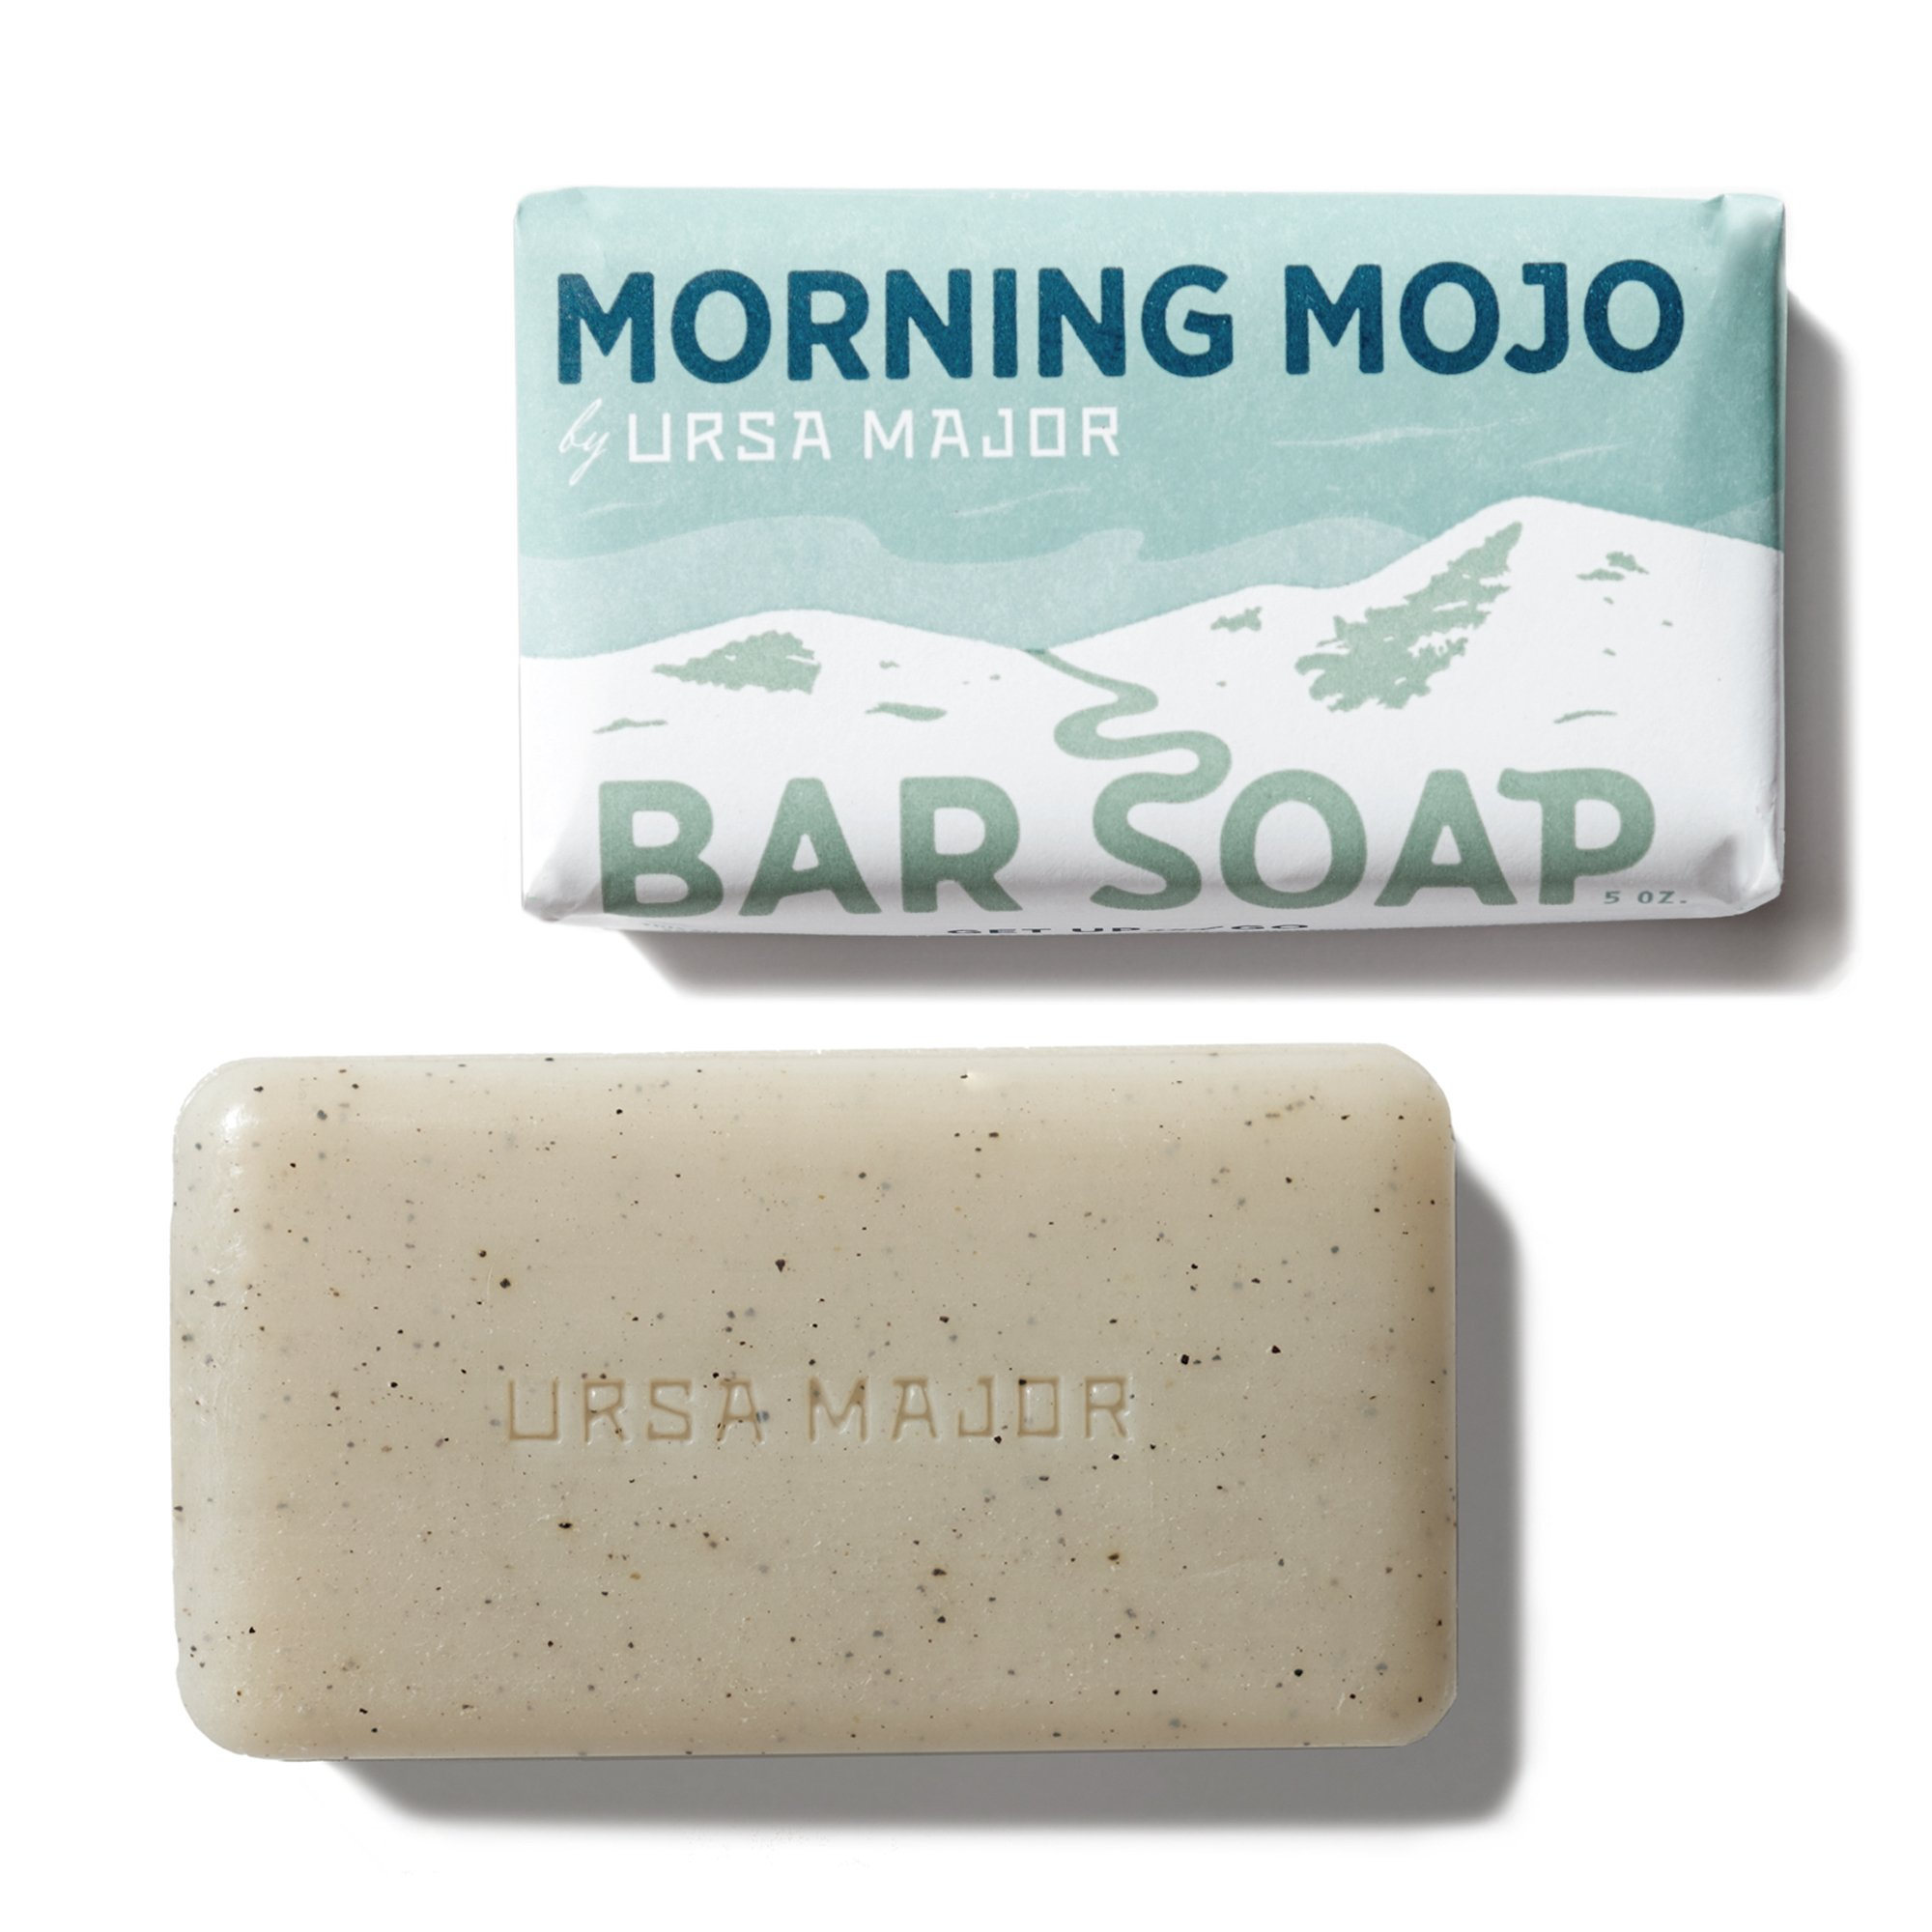 Ursa Major Morning Mojo Bar Soap - Exfoliating Natural Bar Soap with Peppermint, Eucalyptus and Rosemary (5 oz)